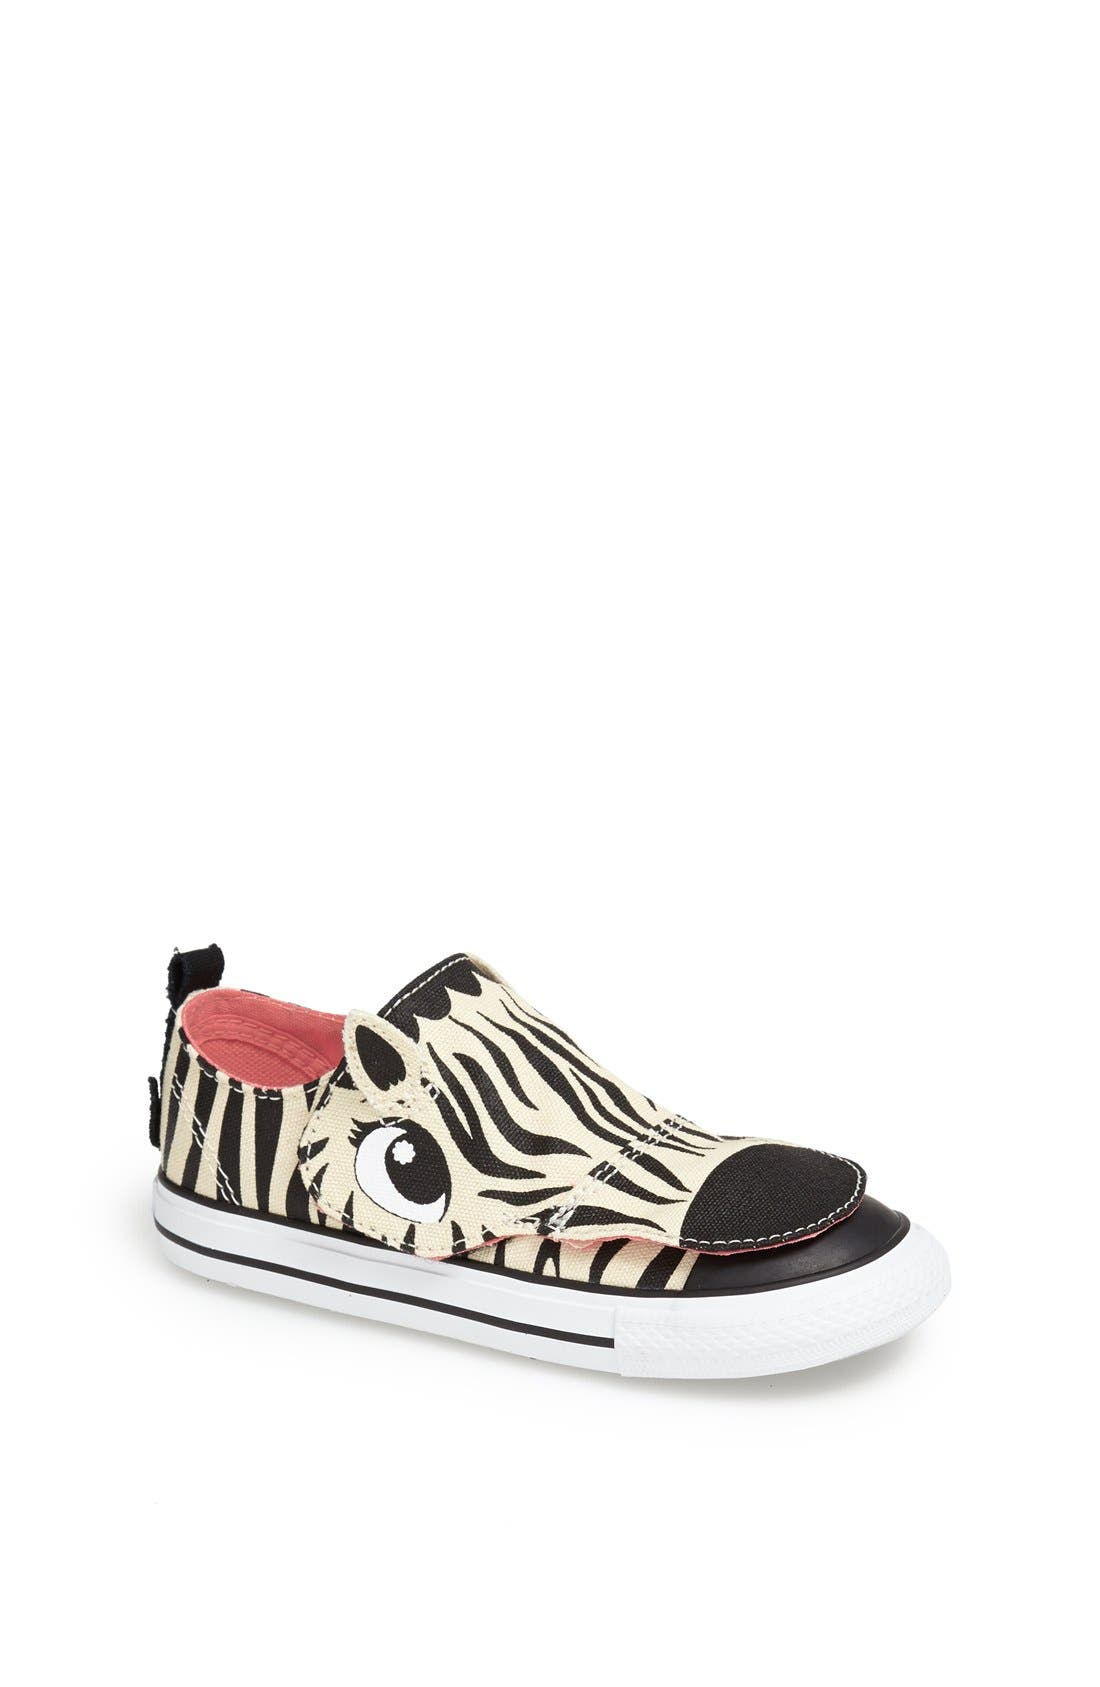 Alternate Image 1 Selected - Converse 'No Problem' Zebra Face Sneaker (Baby, Walker & Toddler)